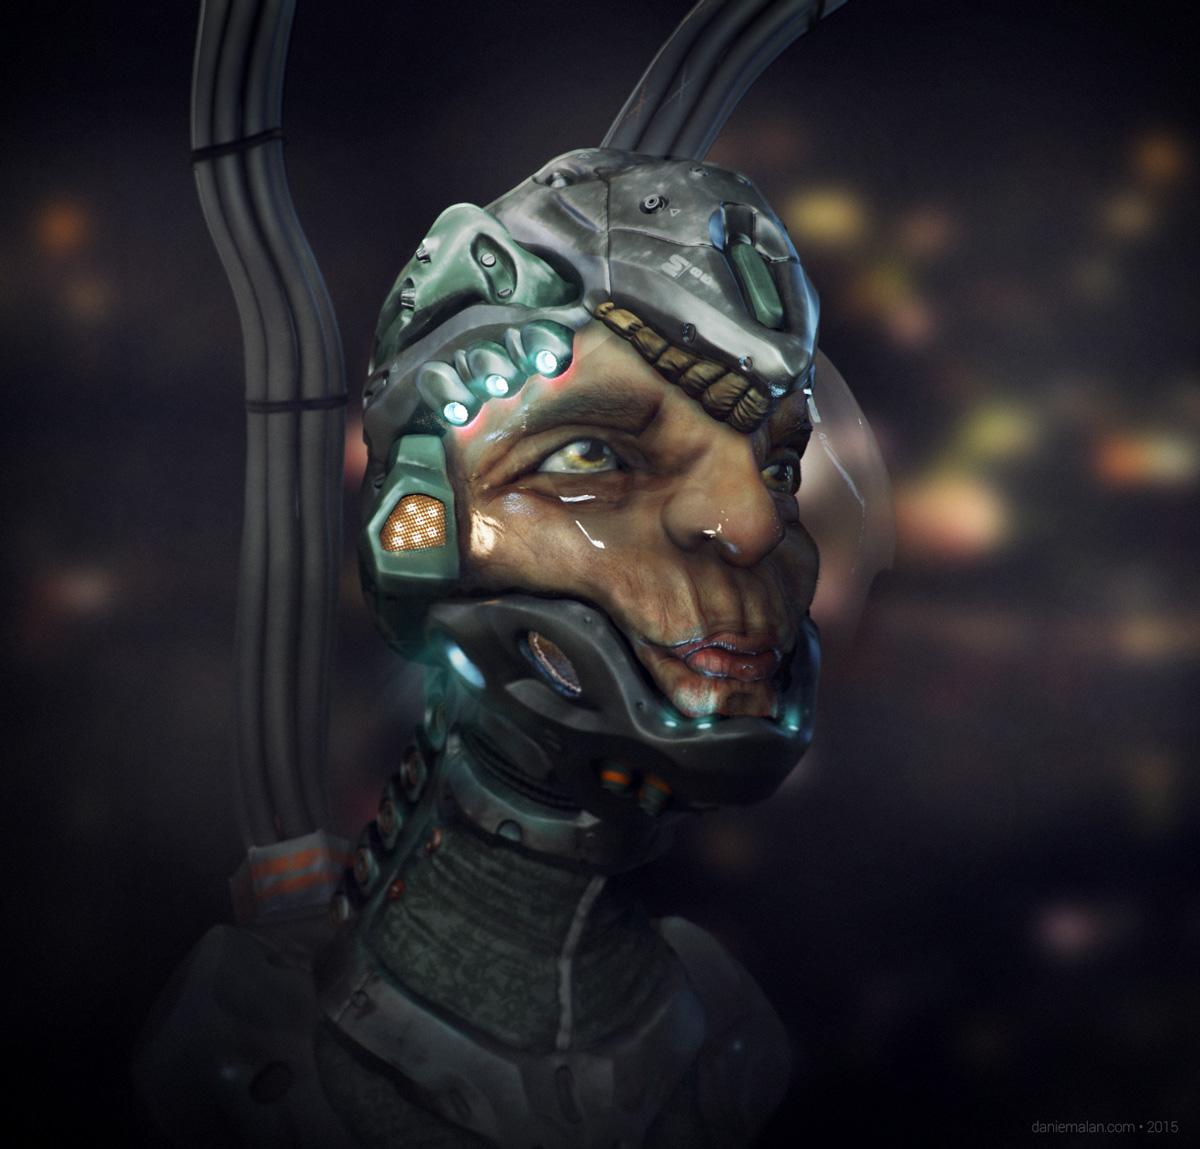 Alien sculpt final render with psd adjustmnets